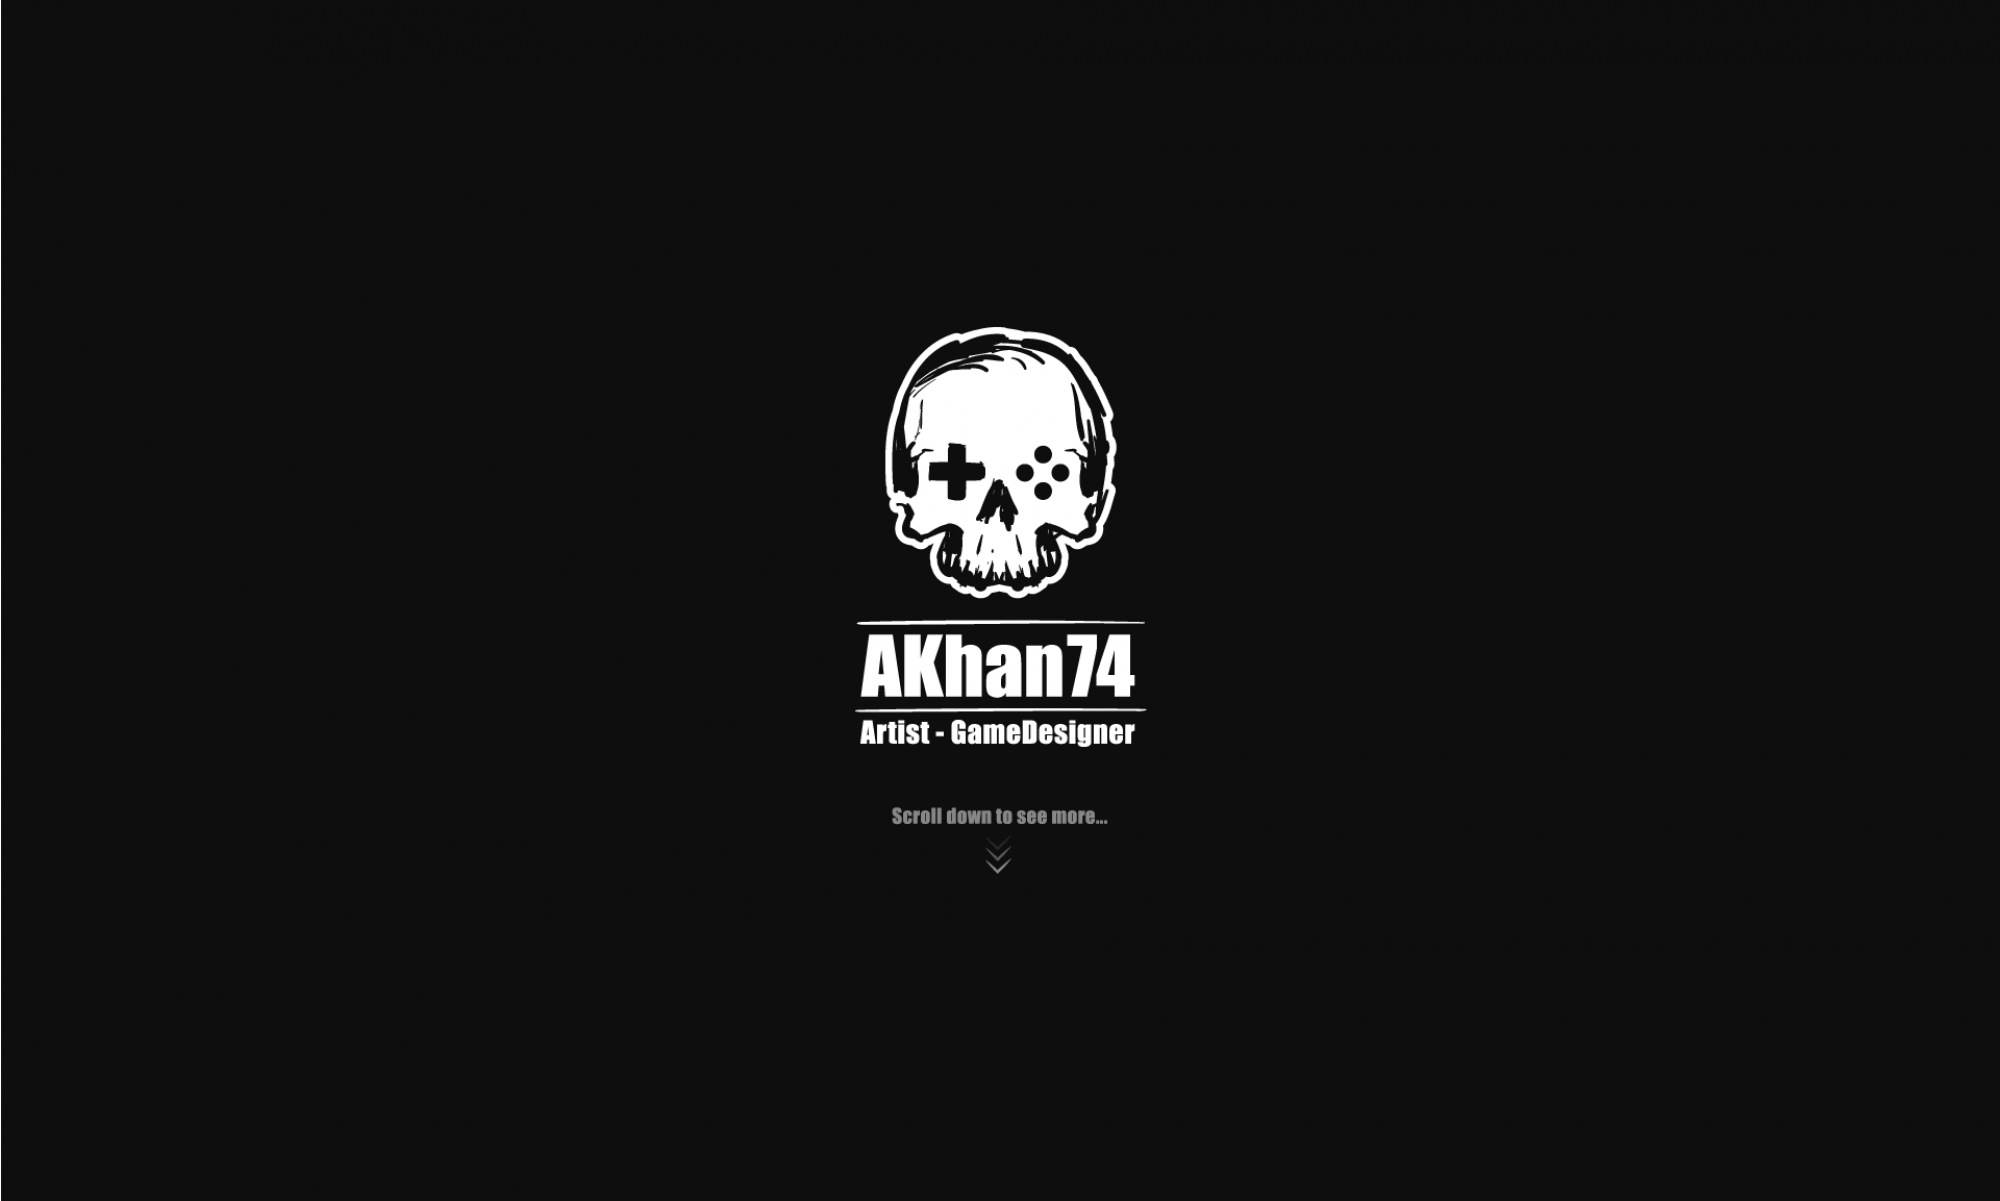 AKhan74 - Game Designer / Artist